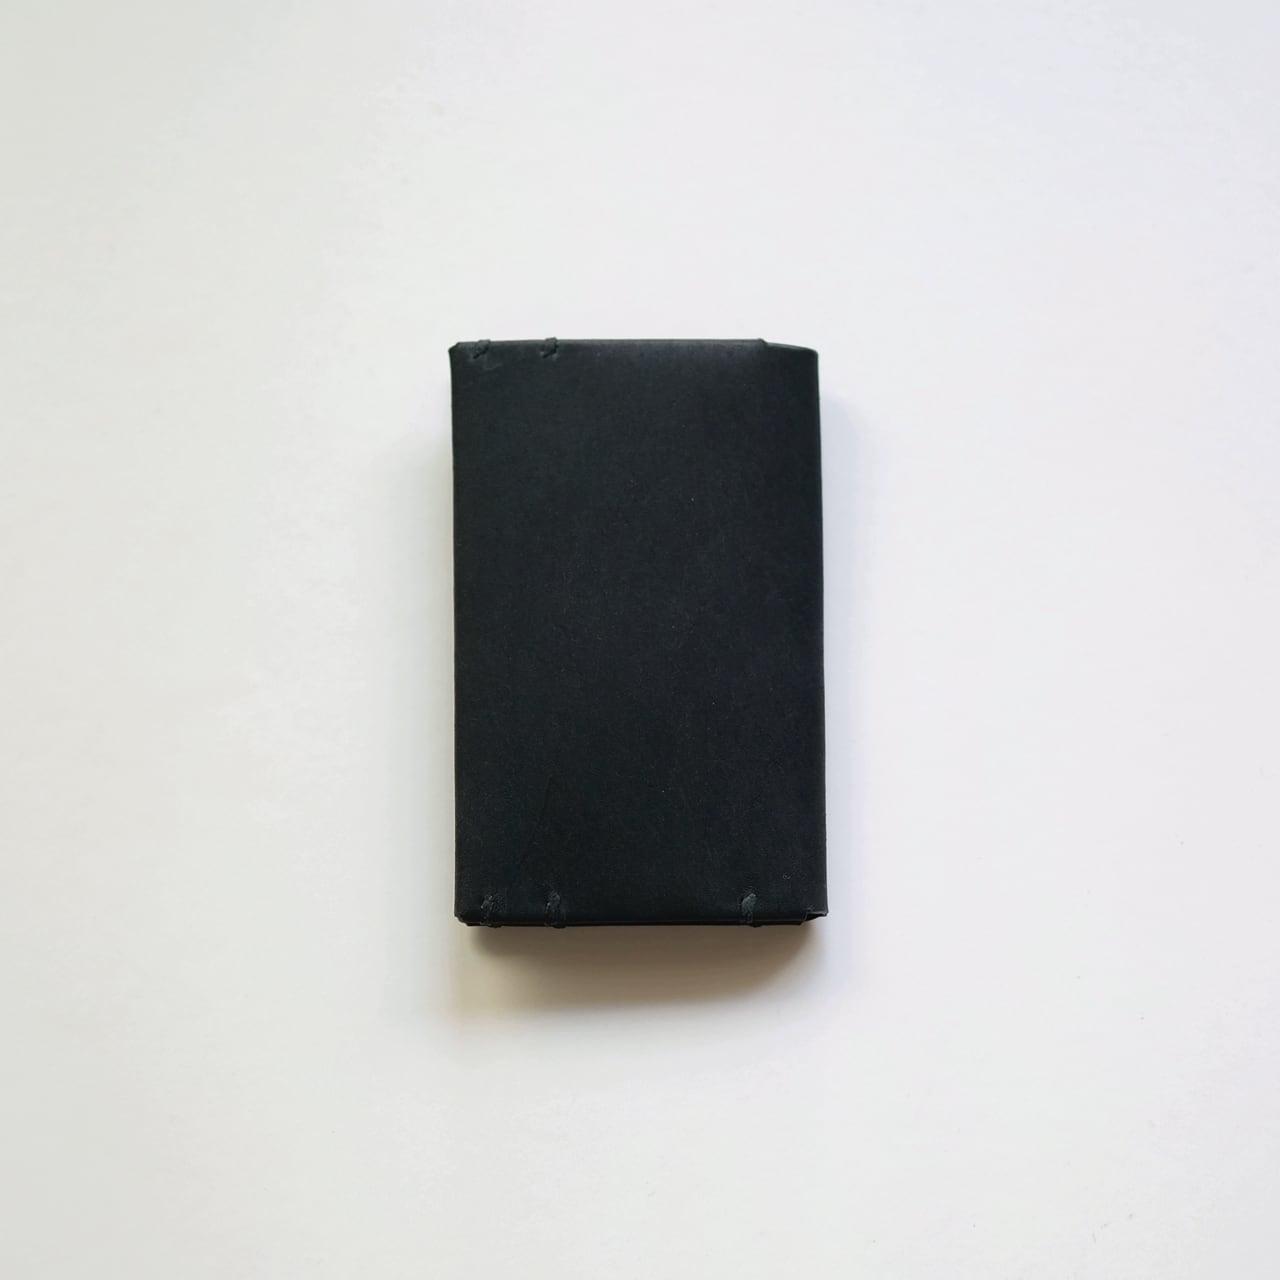 ori cardcase - bk - プエブロ